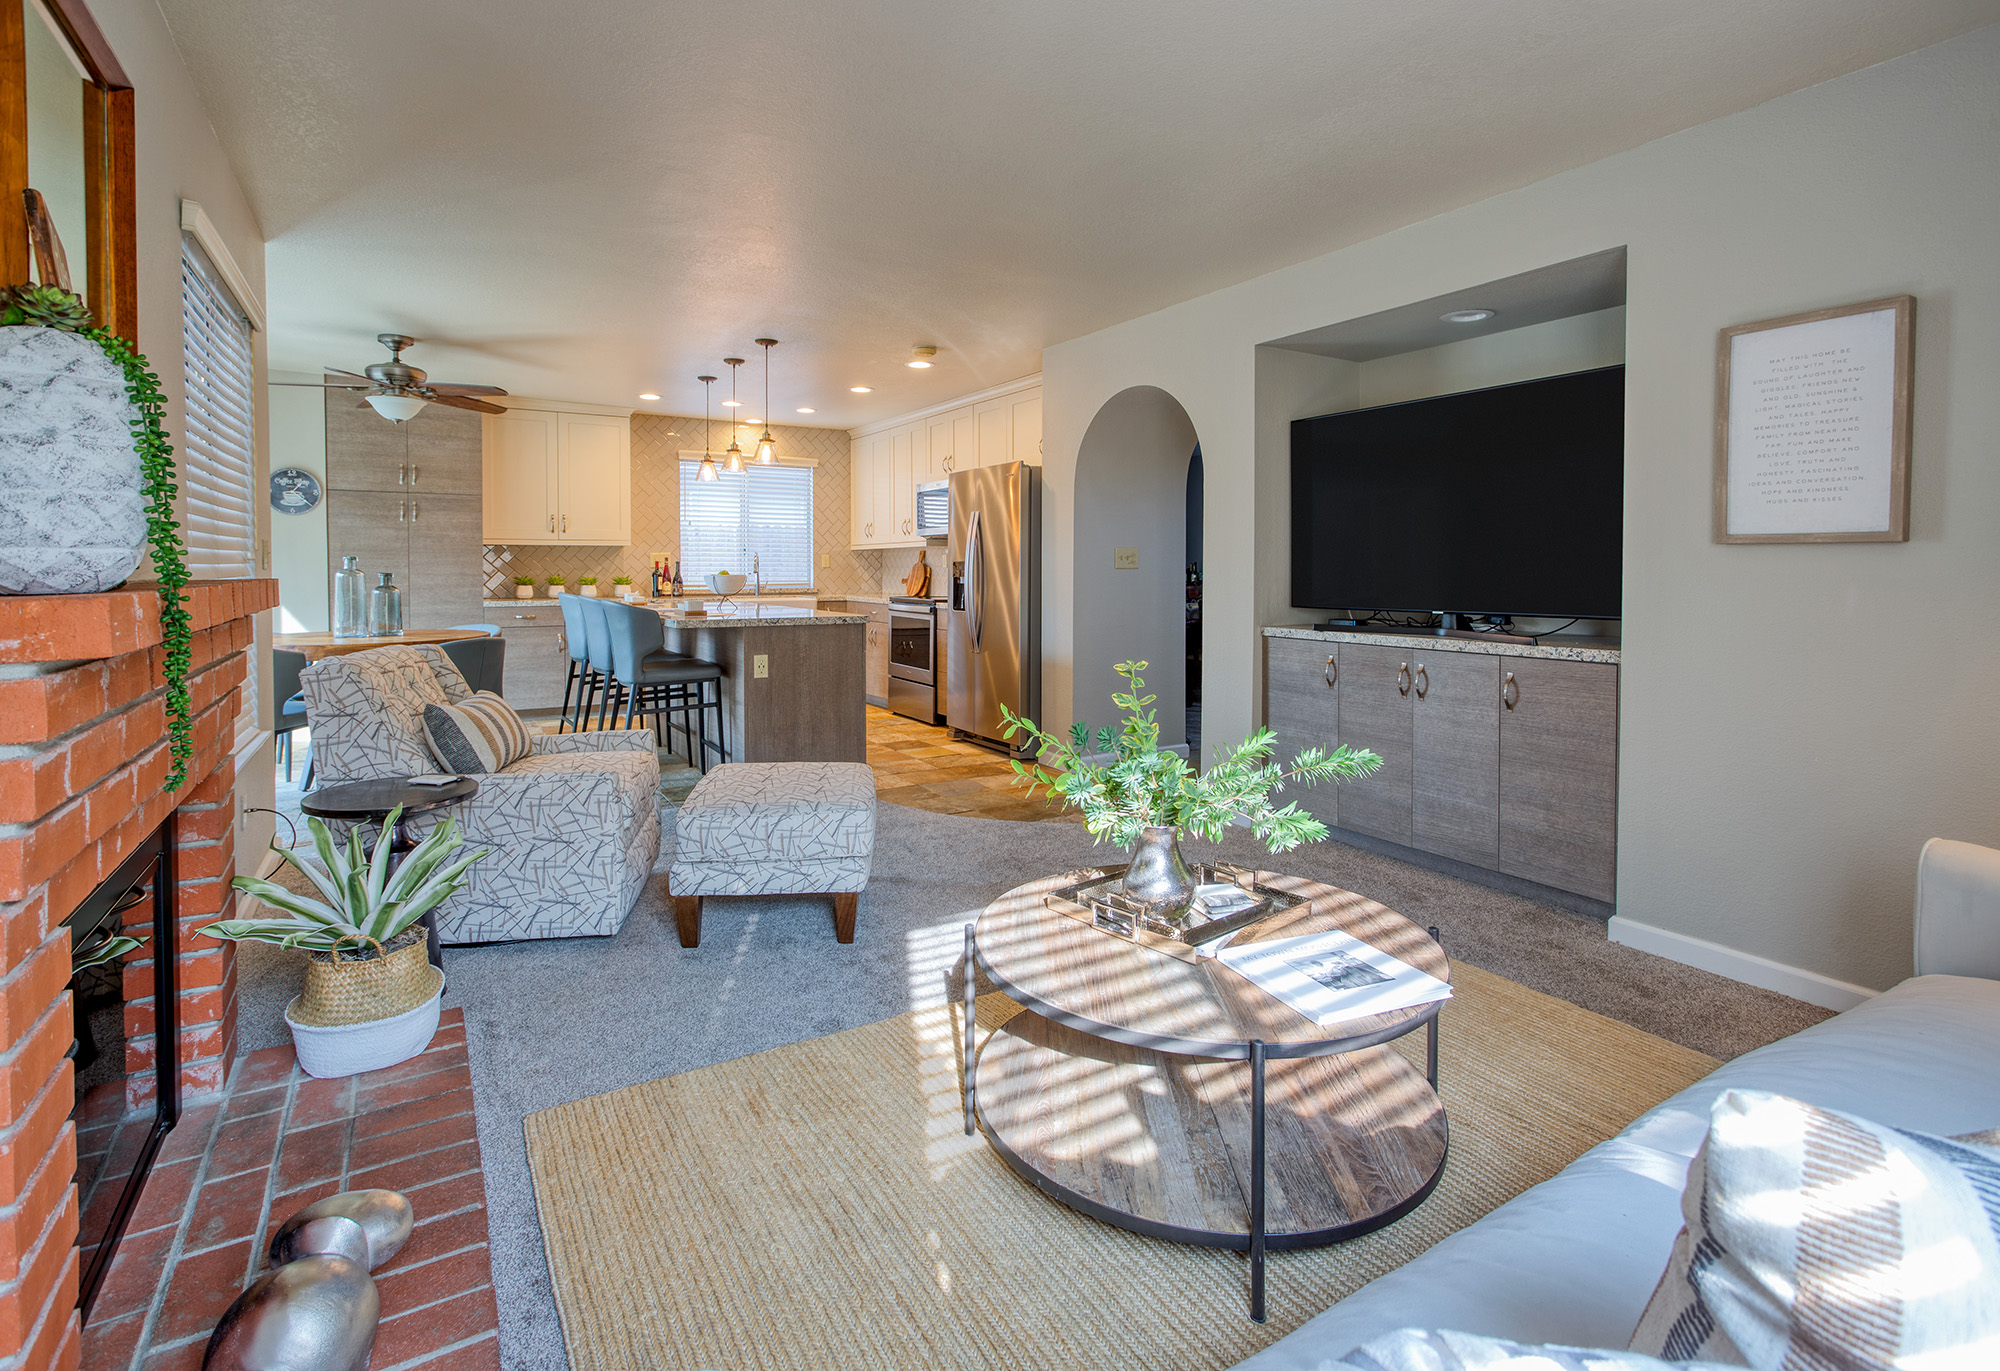 family-room-design-tracy-ca-ktj-design-co-interior-design.jpg